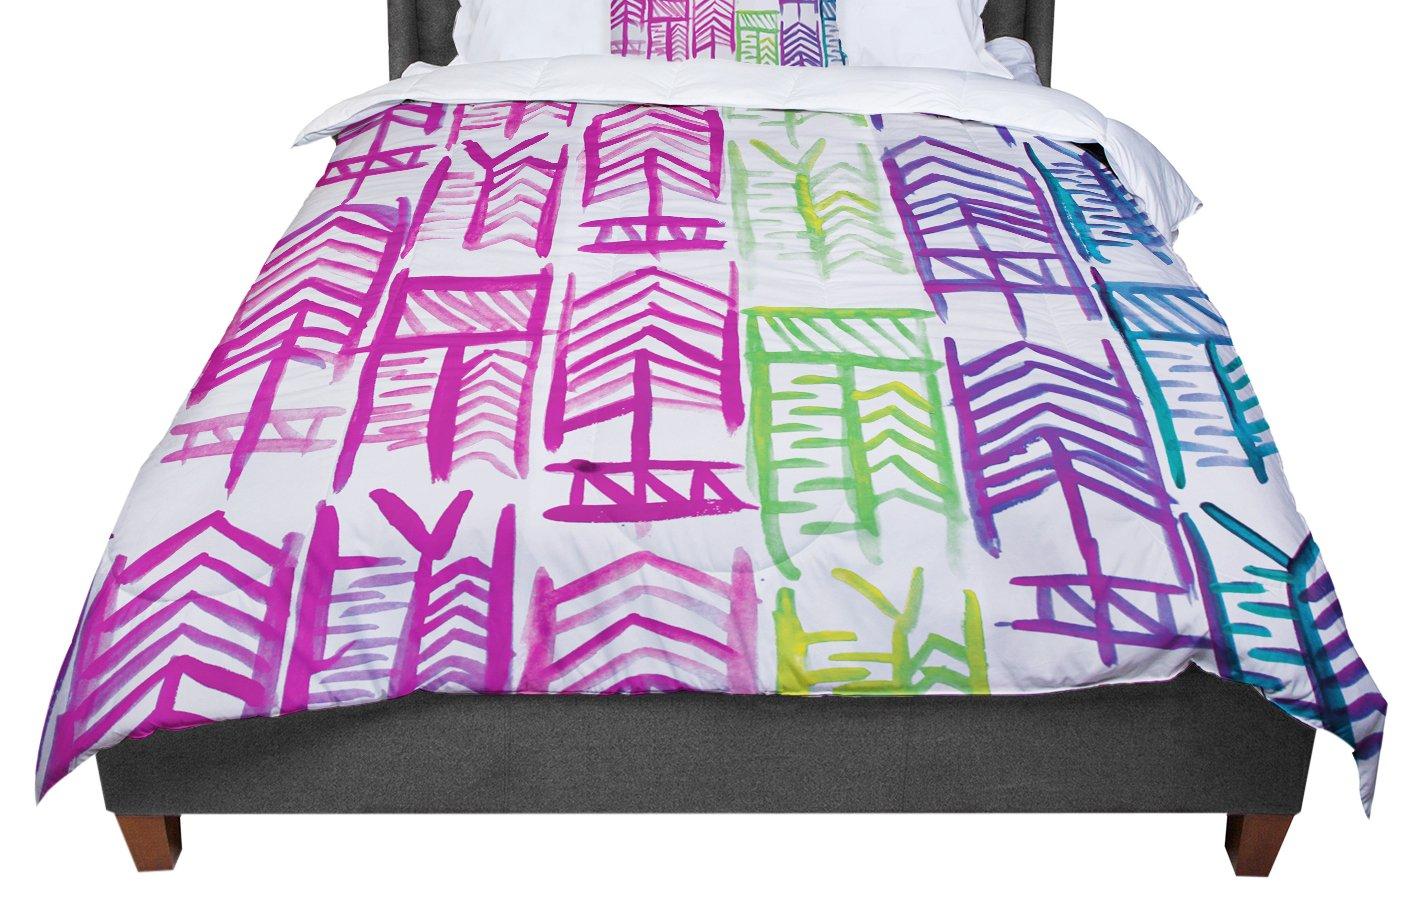 88 X 88 KESS InHouse Theresa Giolzetti Quiver III Queen Comforter